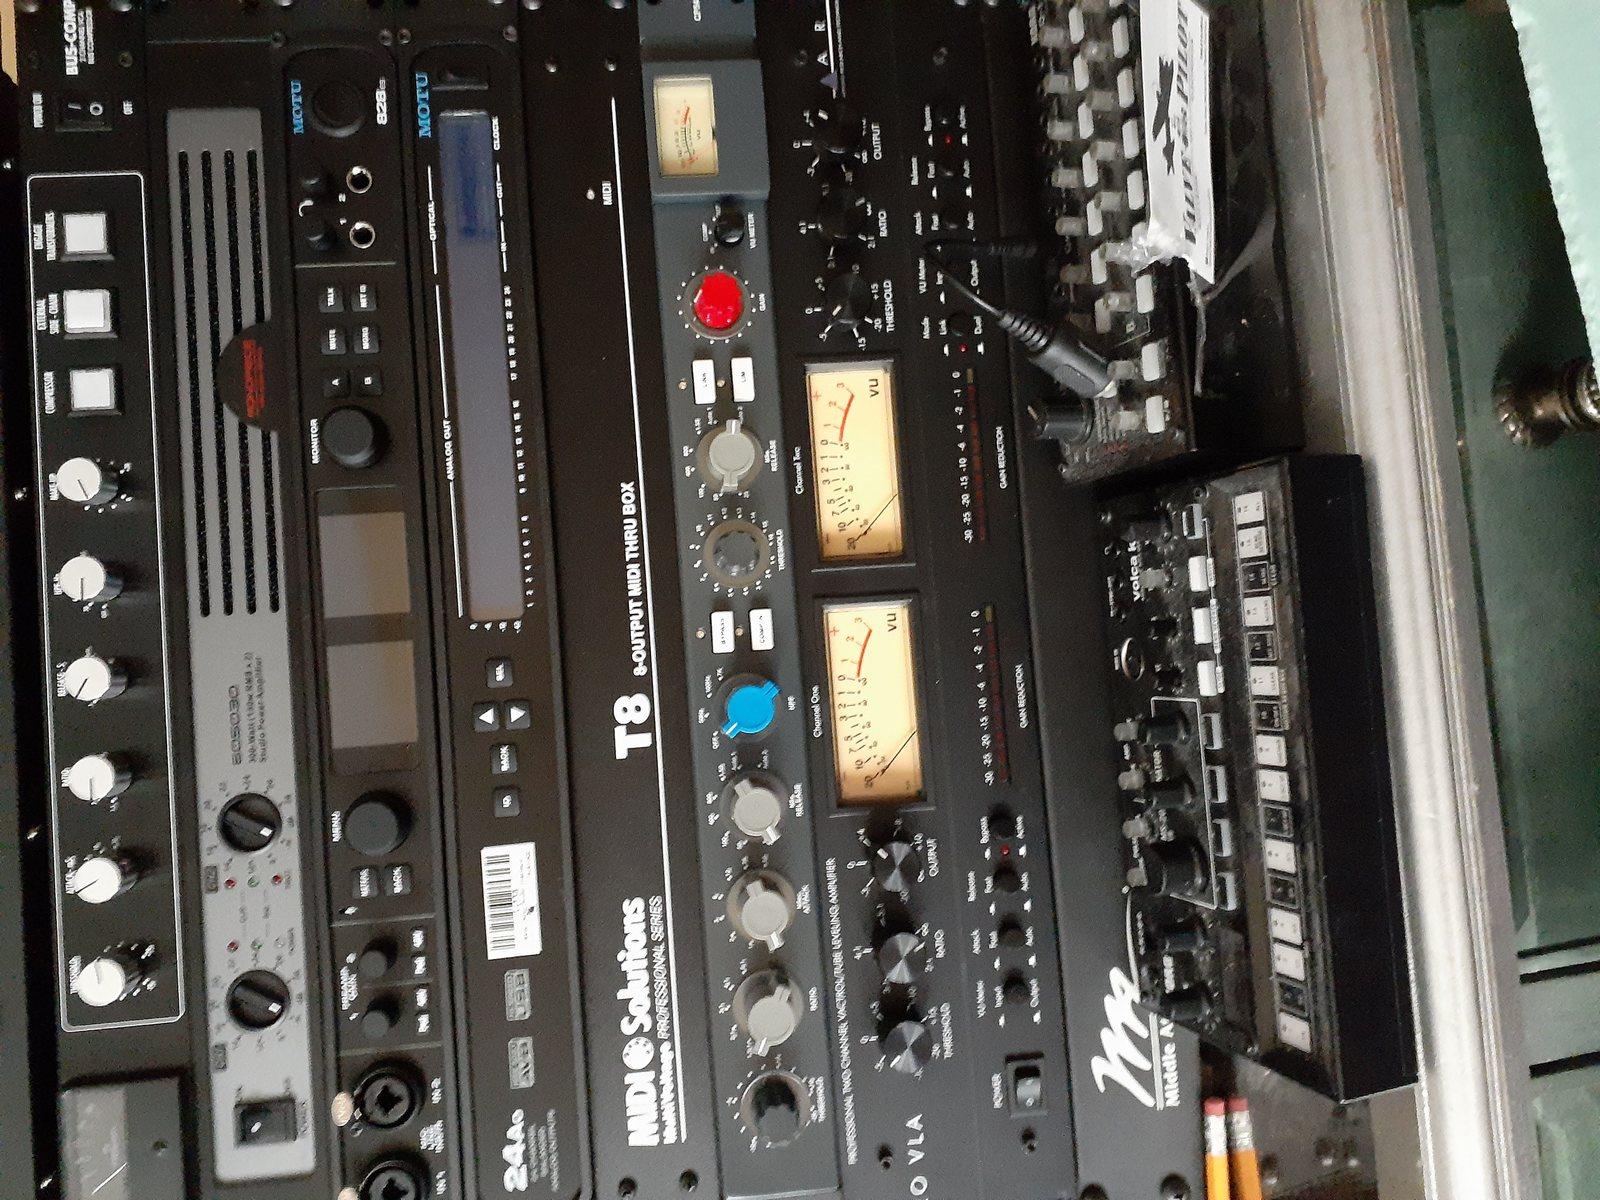 jimmarchi1's music gear photo